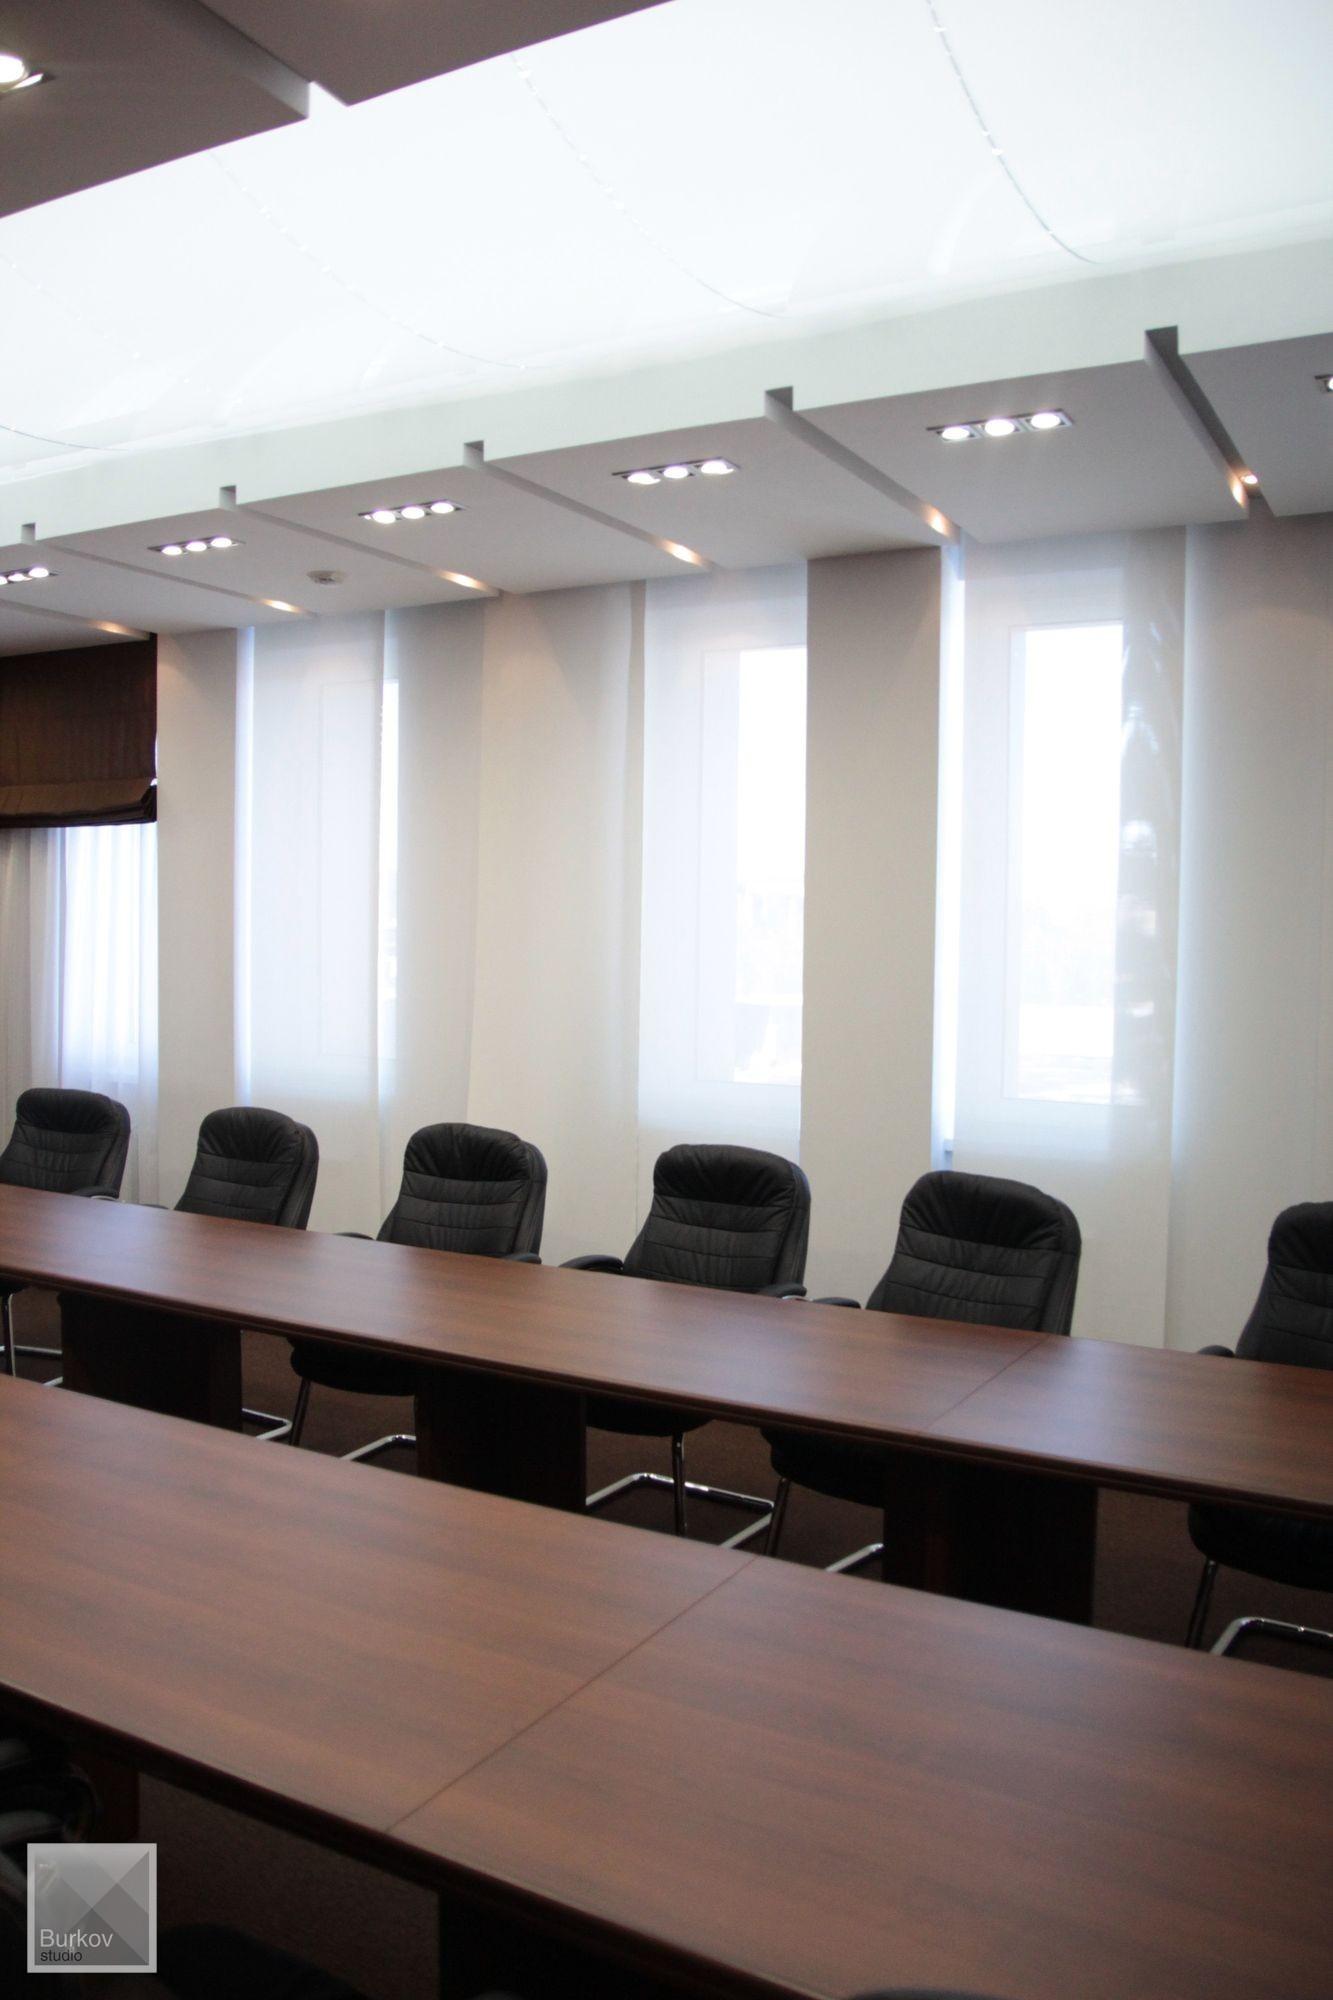 Зал совещаний, дизайн потолка